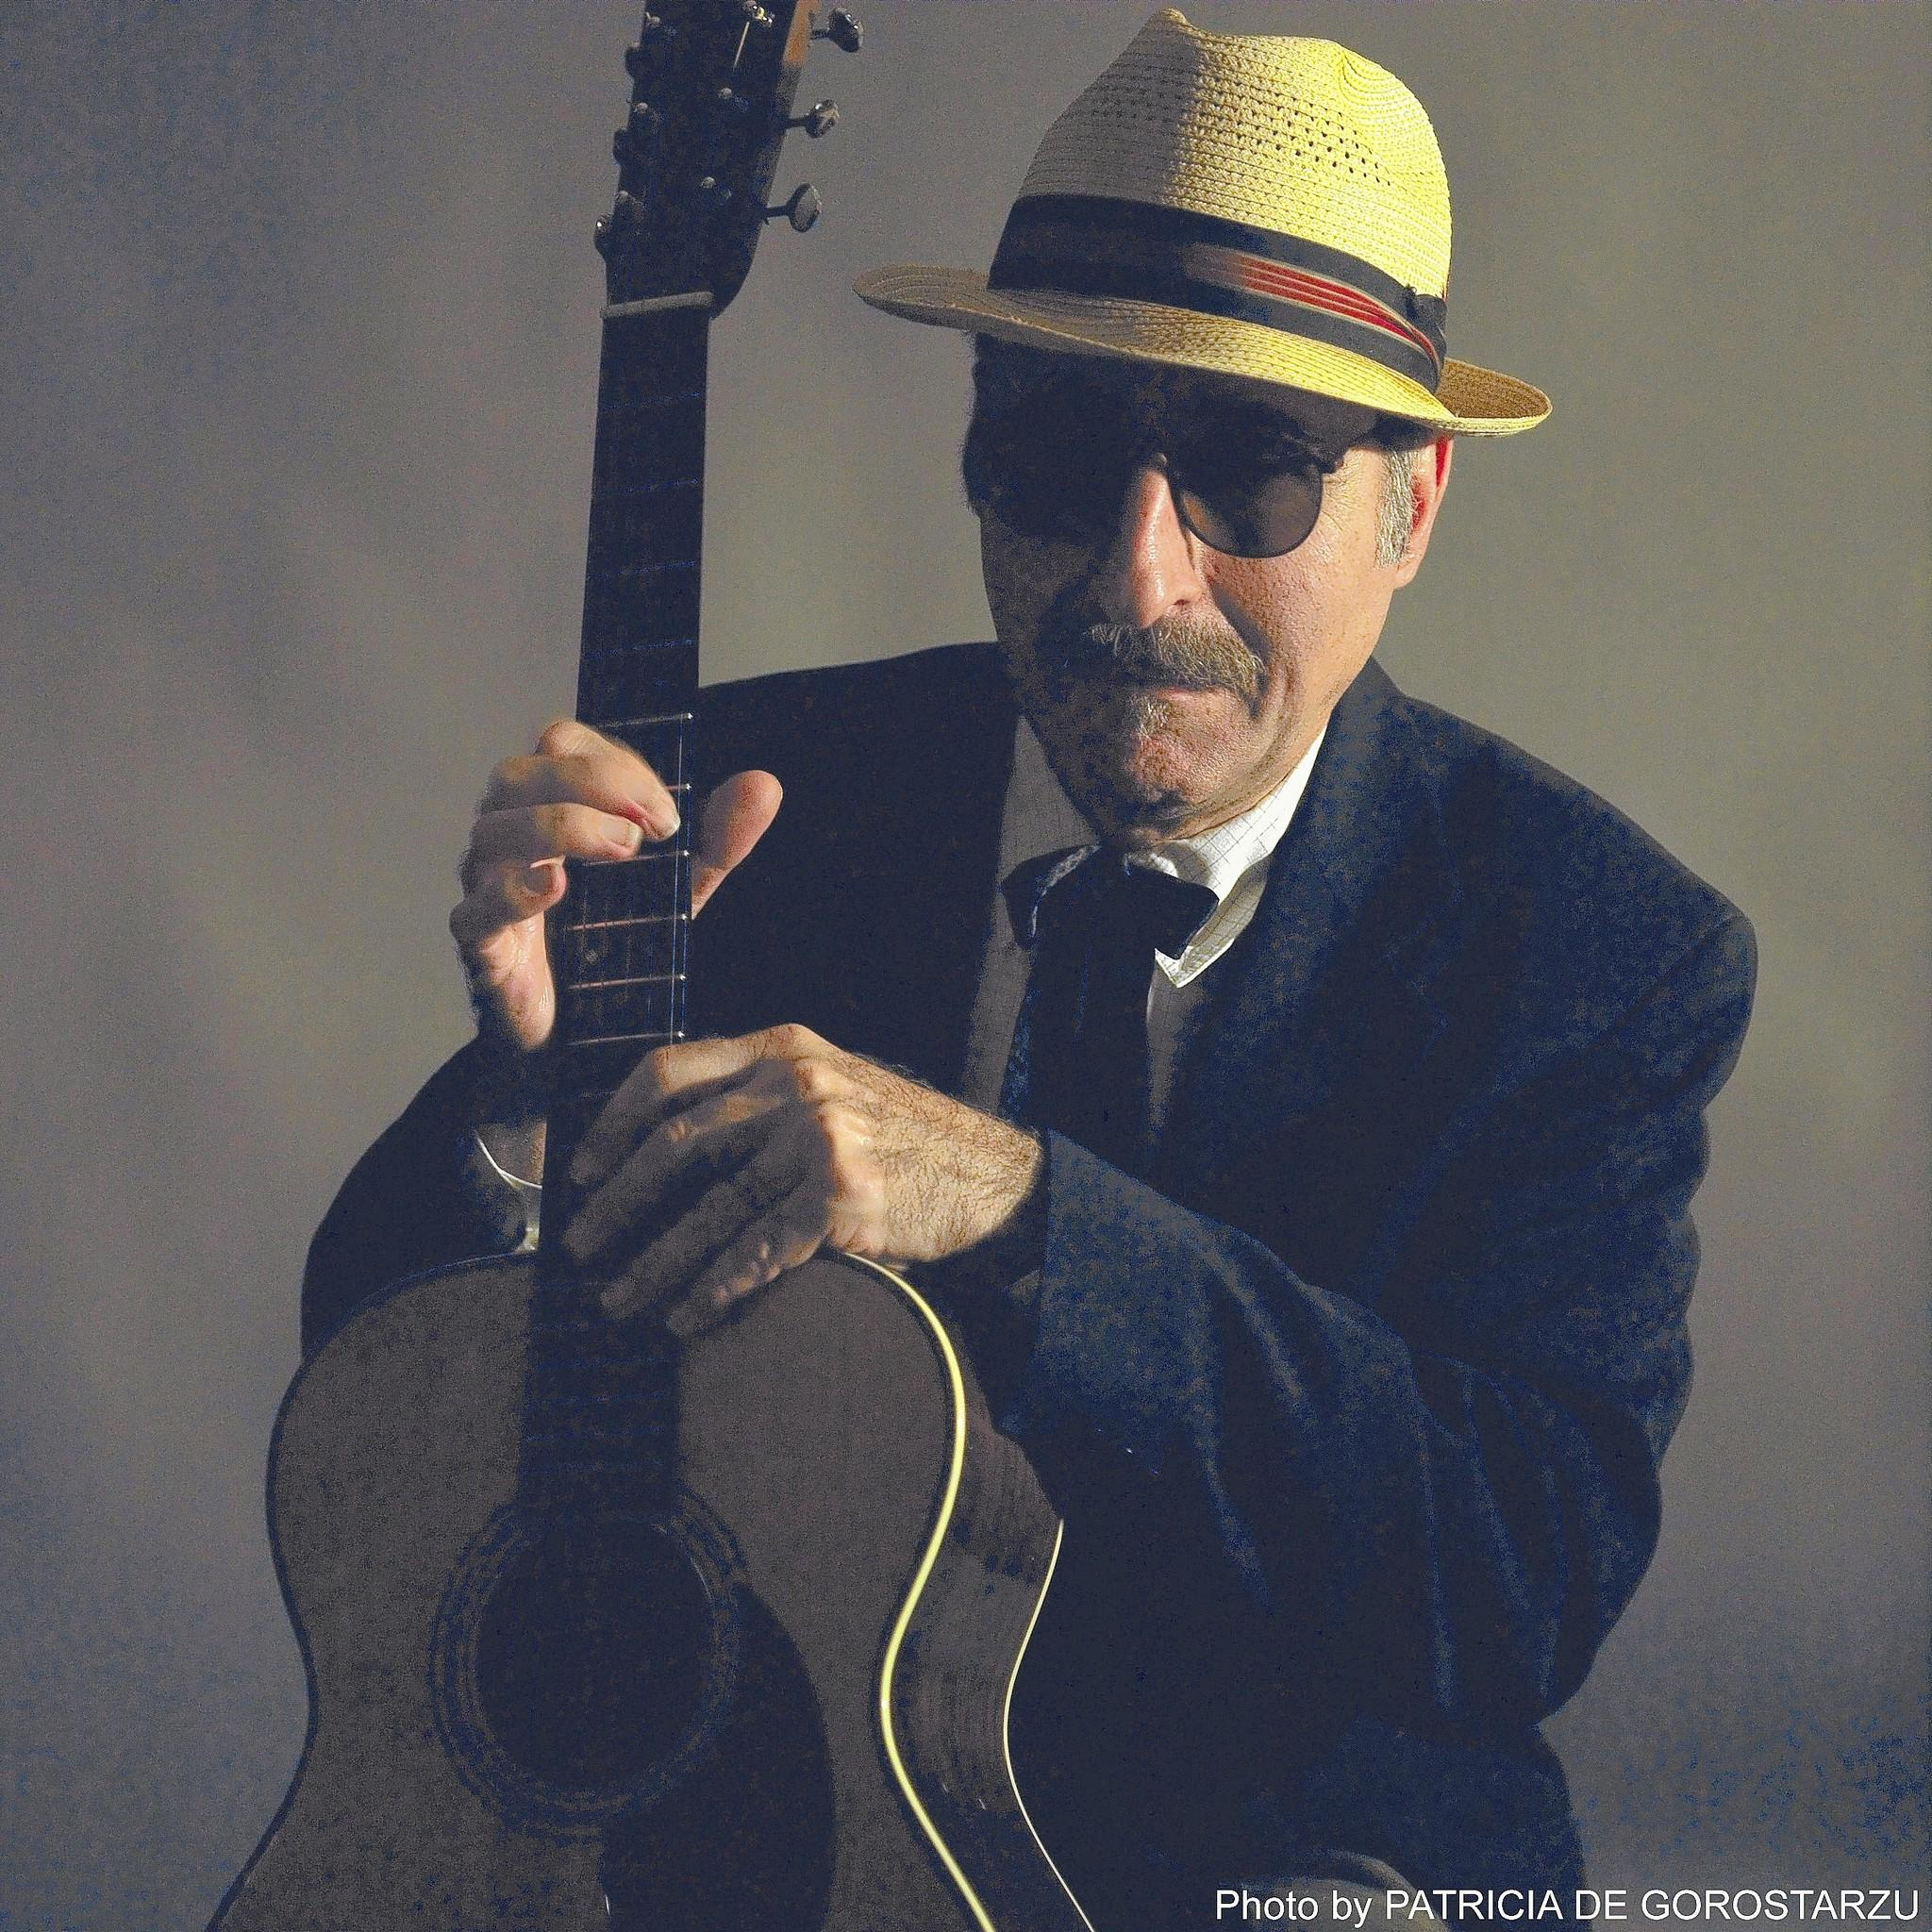 Leon Redbone will perform Friday, Feb. 21, at the Mount Dora Music Festival.